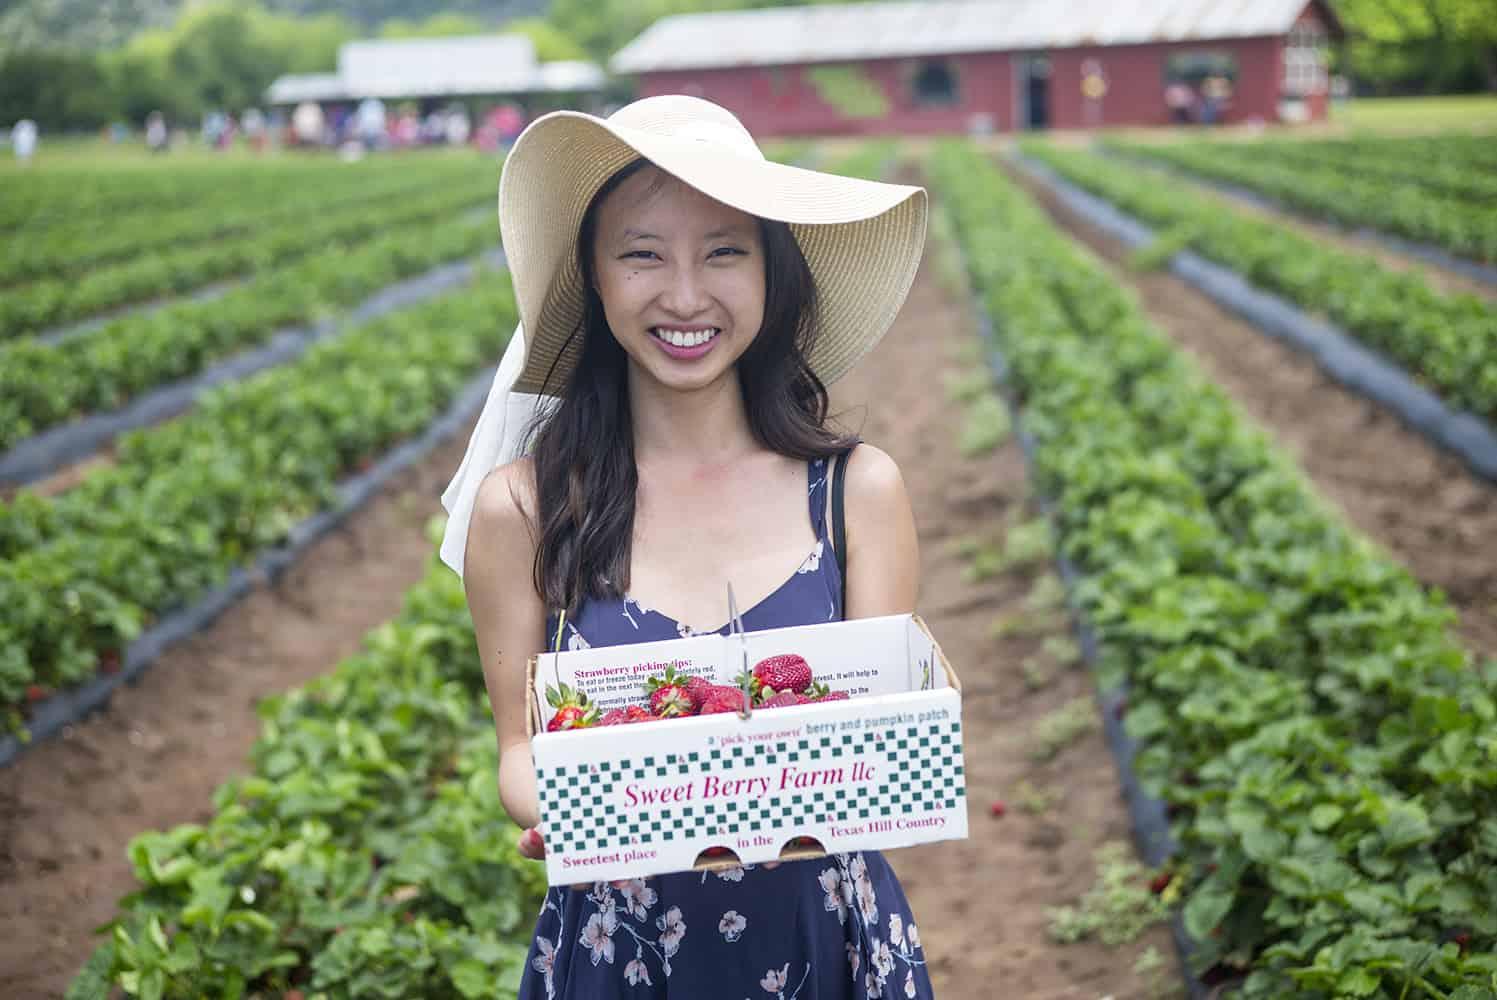 Strawberry Picking At Sweet Berry Farm - A Taste of Koko